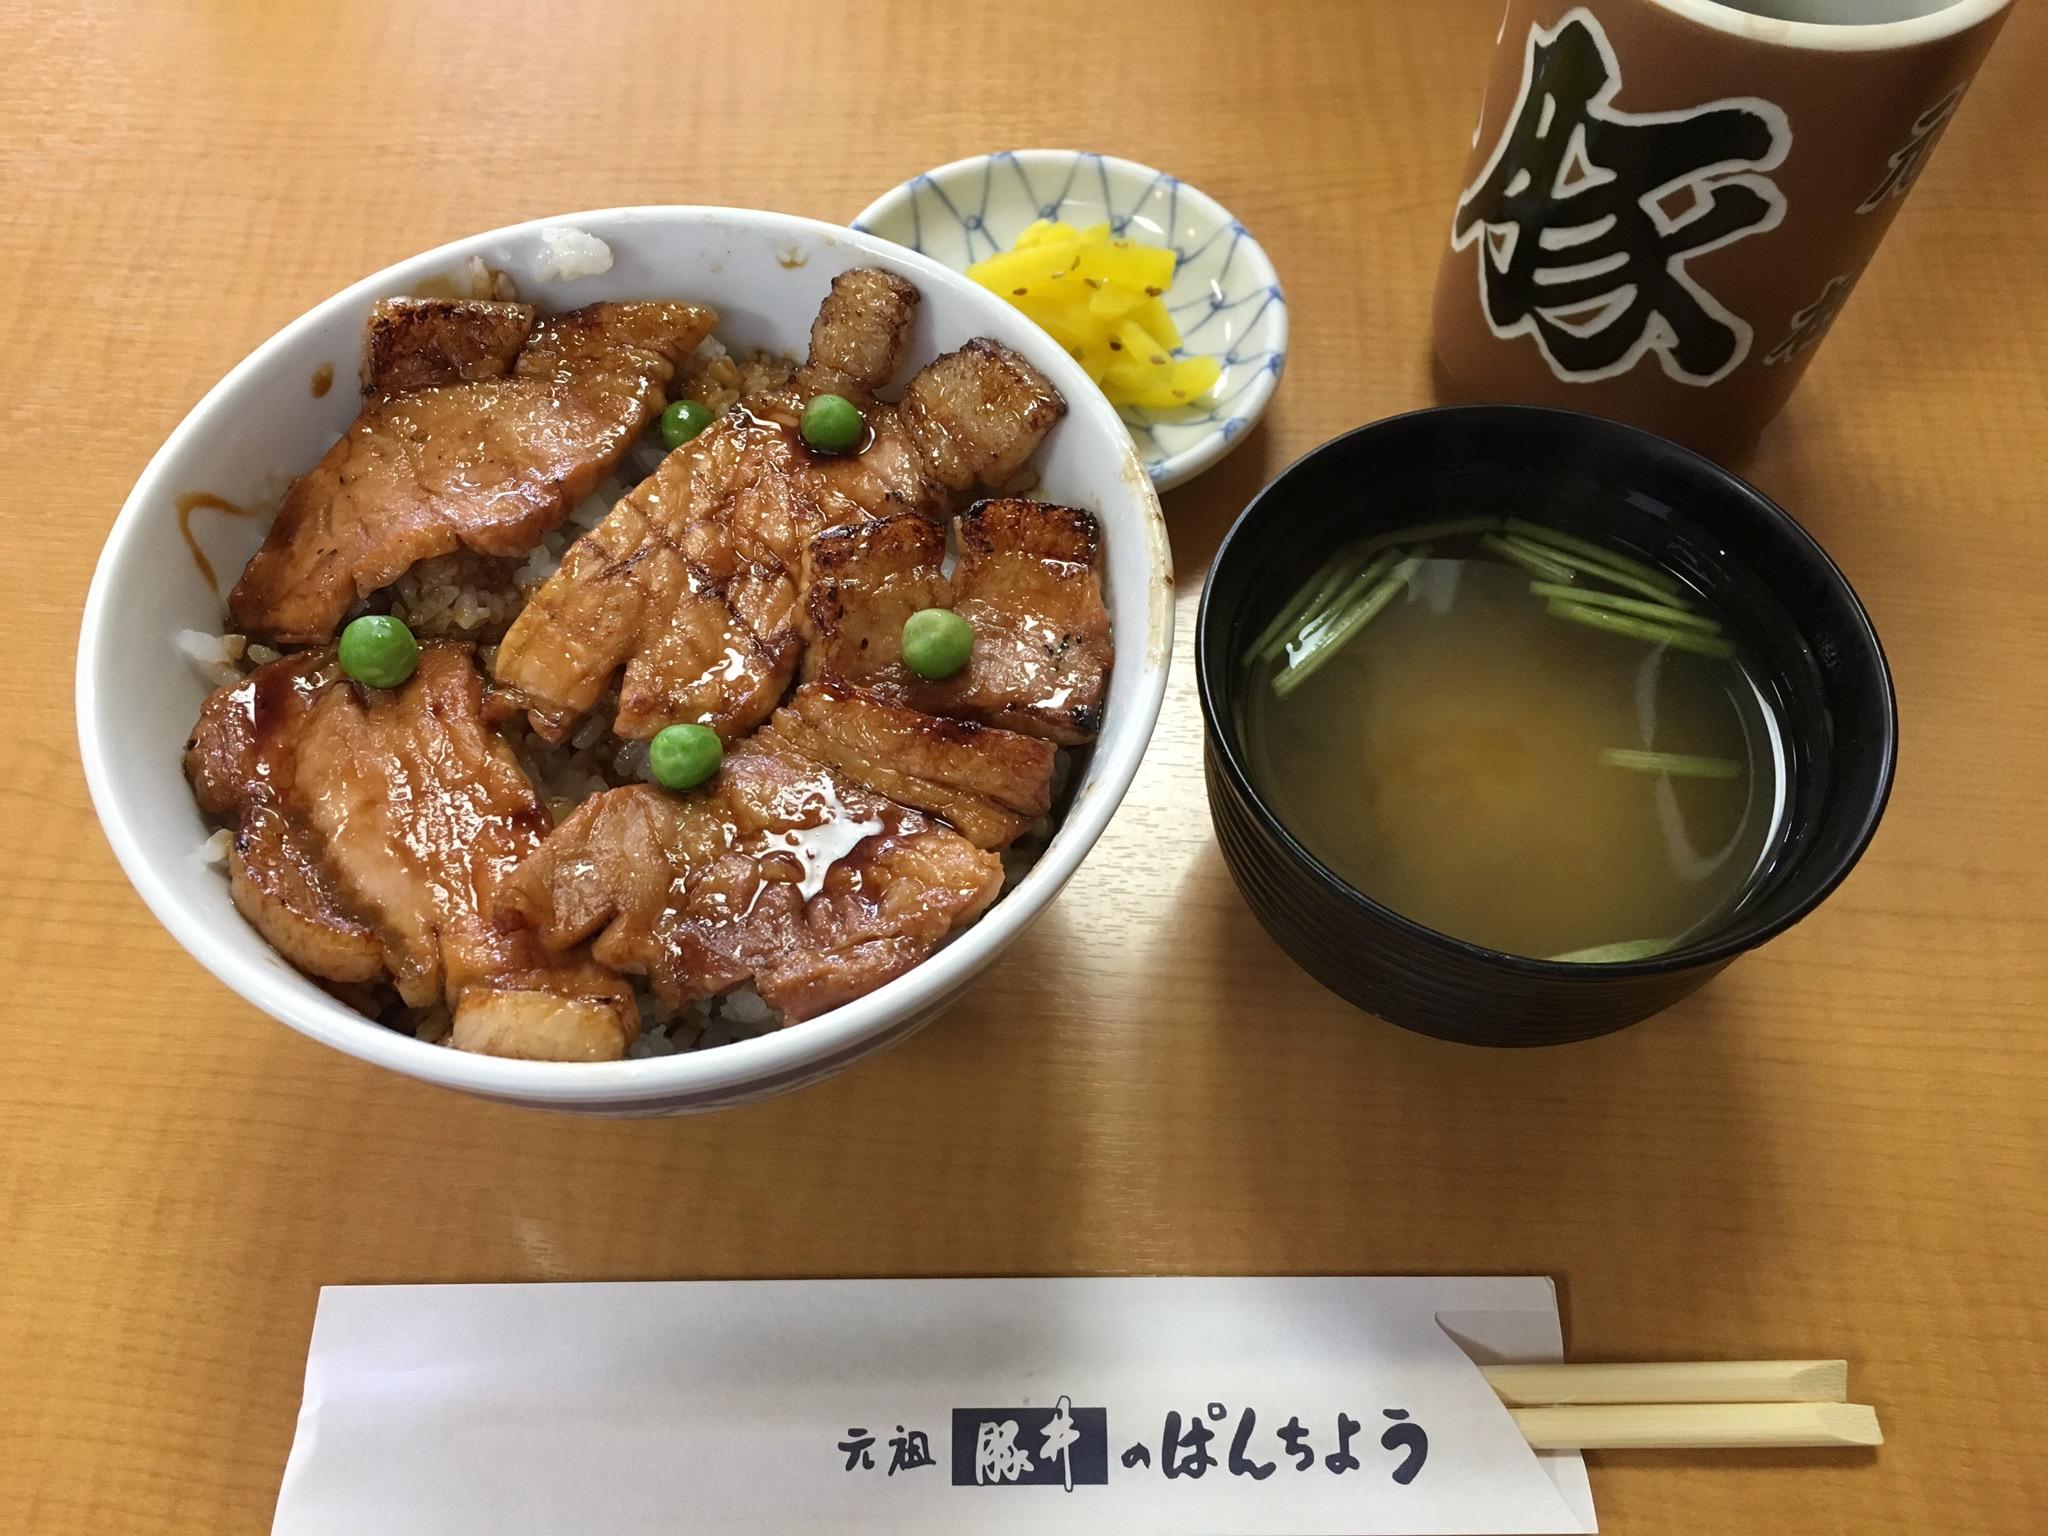 http://blog.gutabi.jp/special008/up_images/IMG_0002.jpg